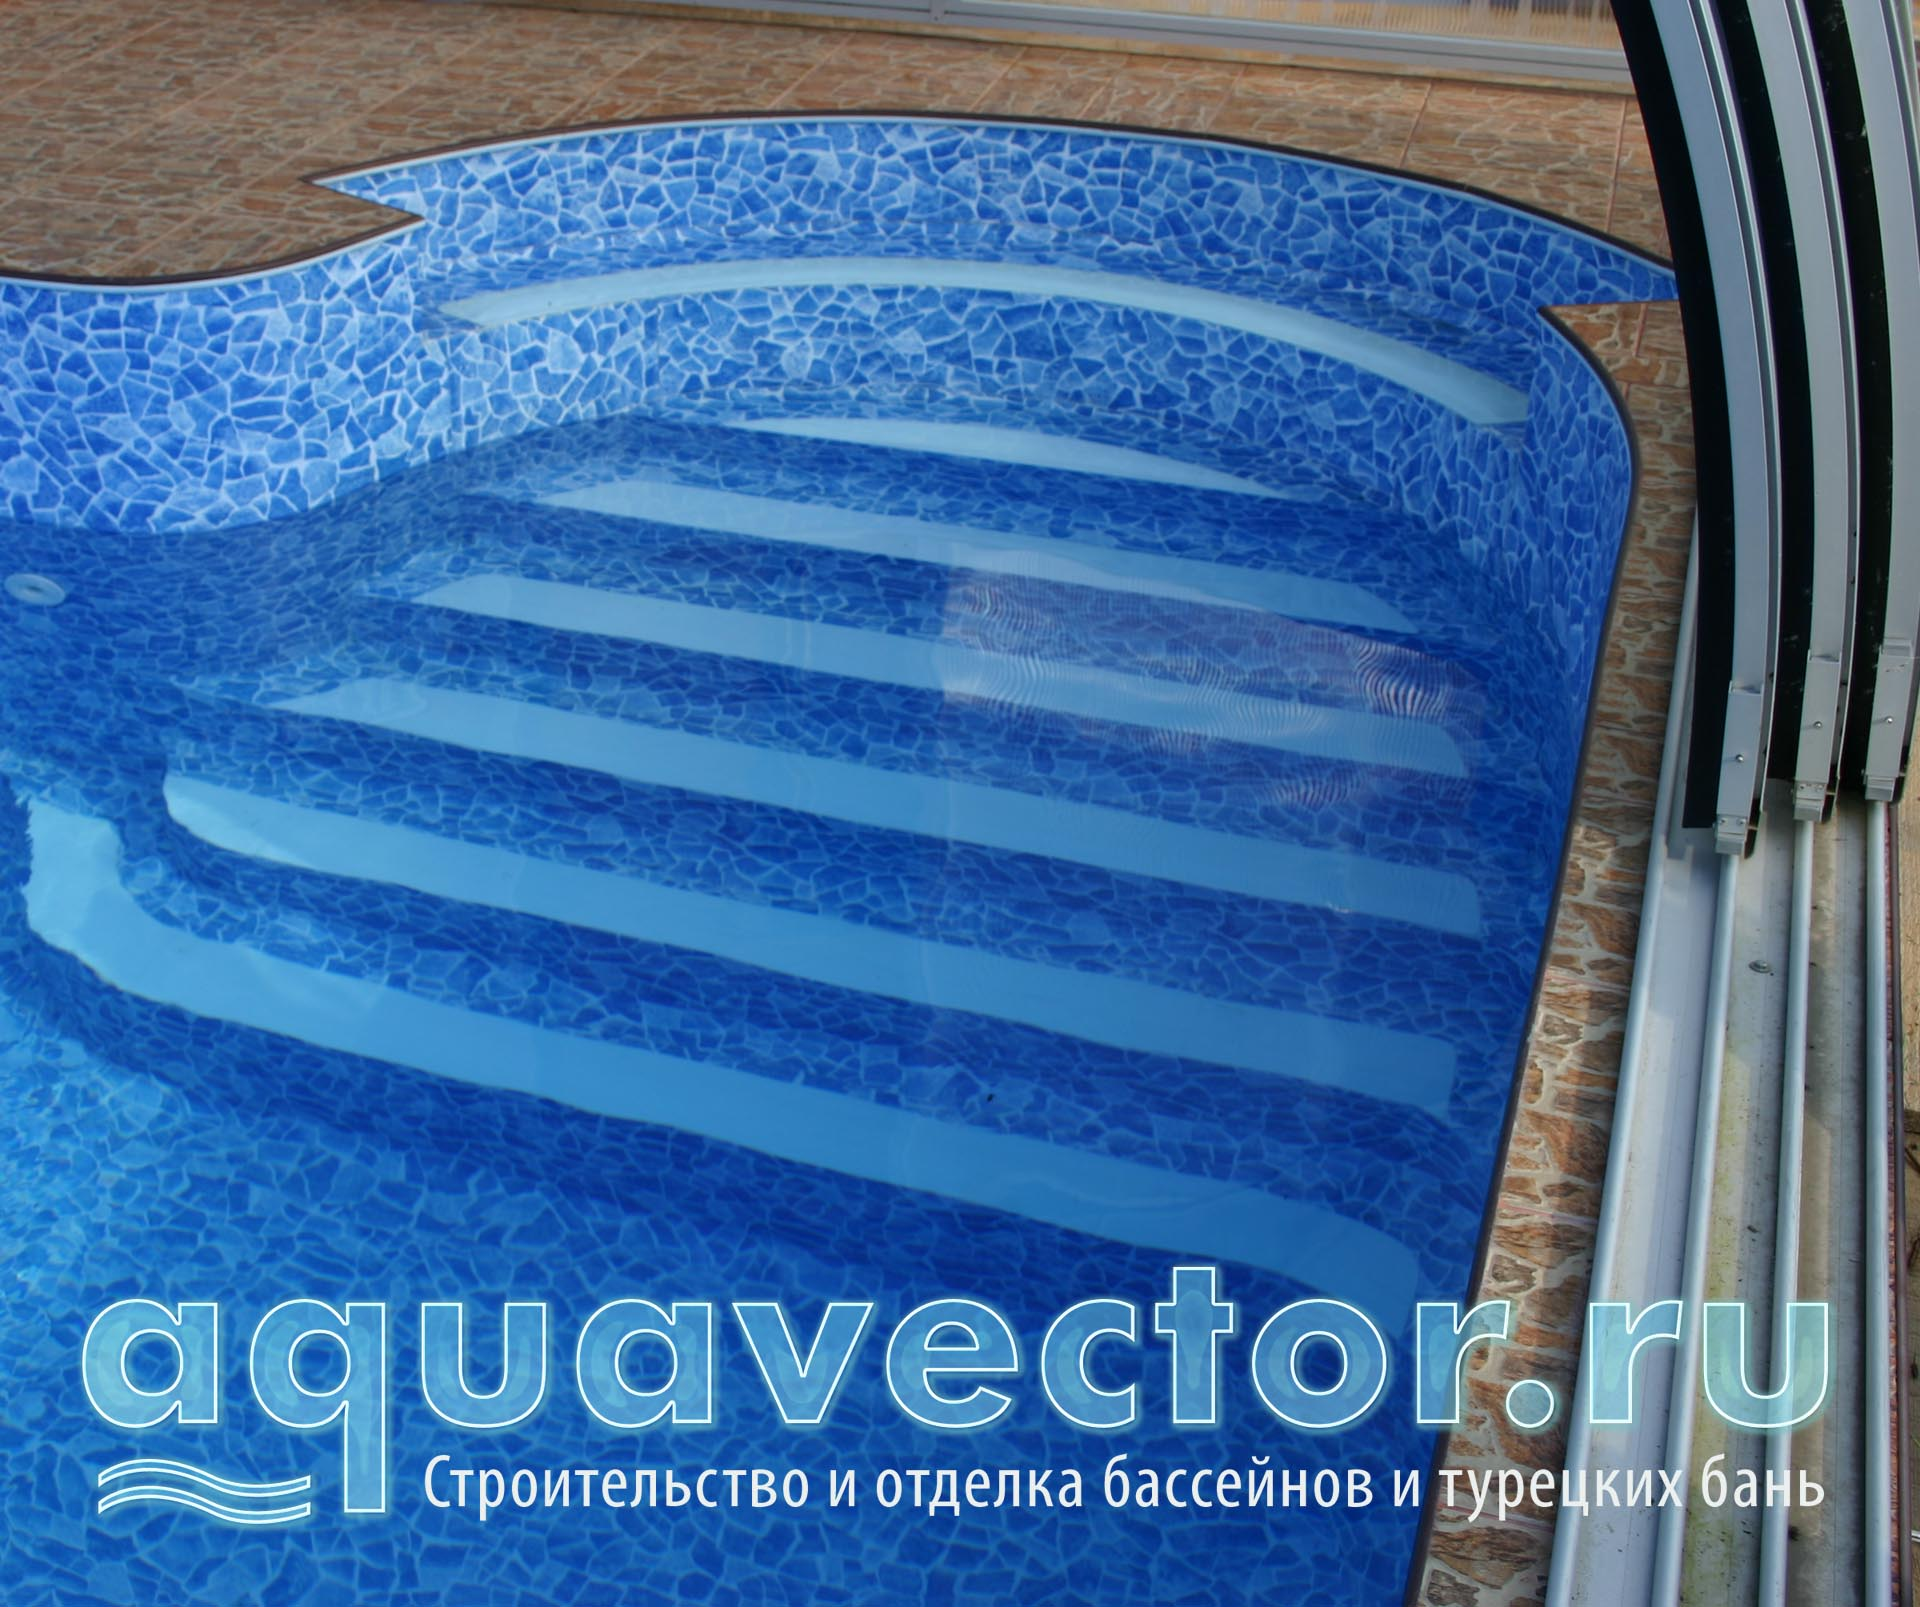 Плёночный бассейн под павильоном